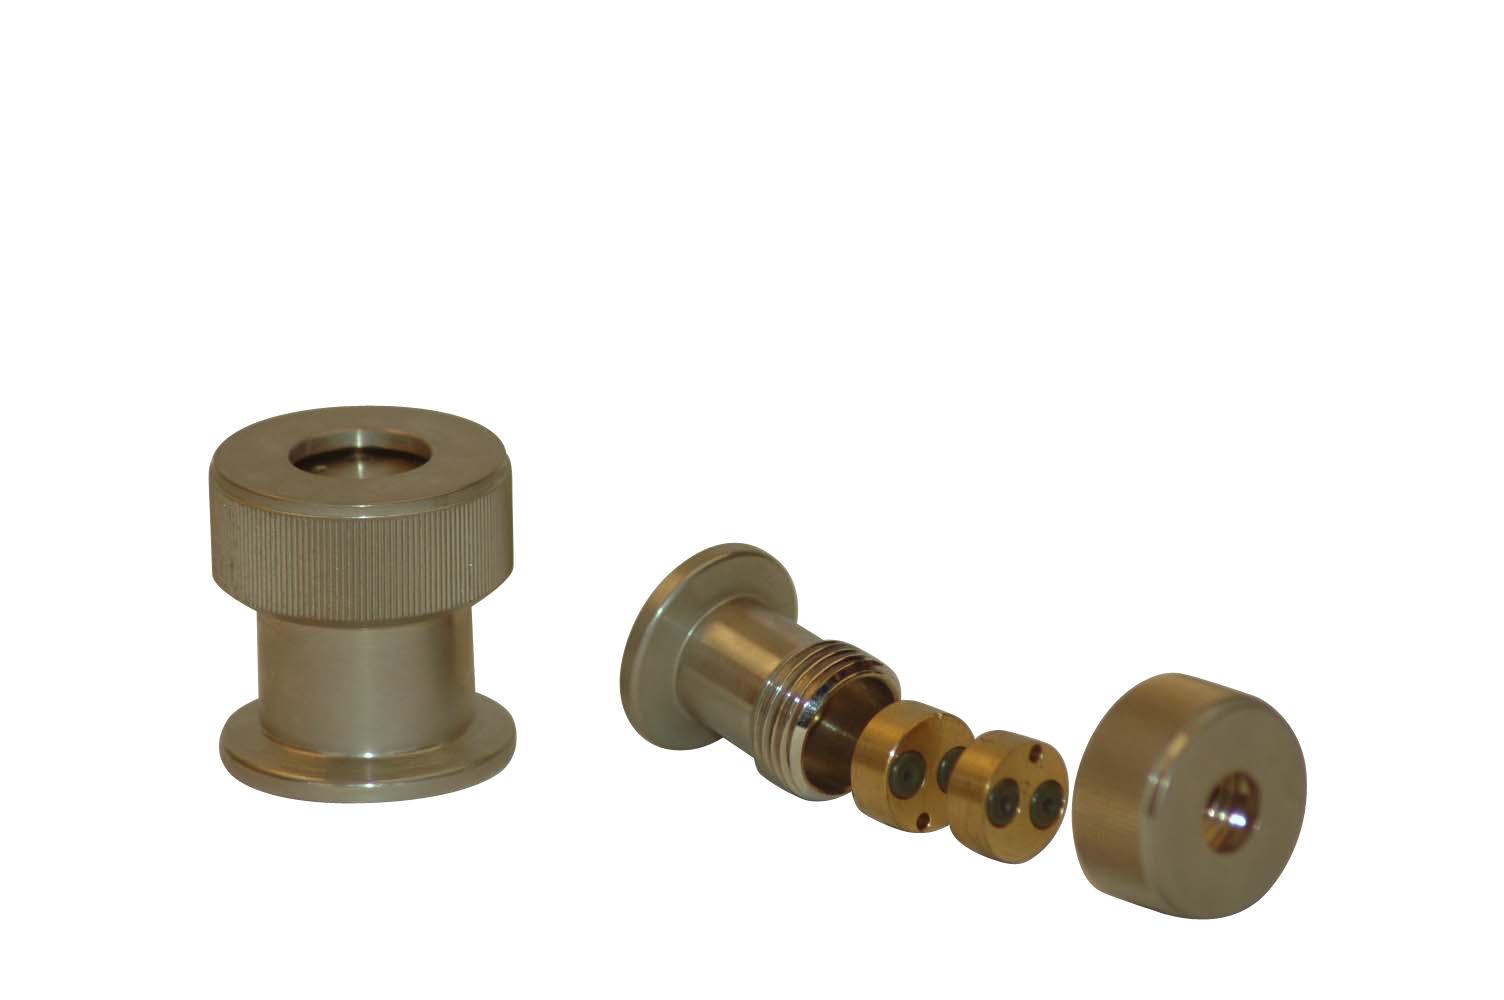 Themocouple feedthrough 2 pins, stainless steel, DN40KF